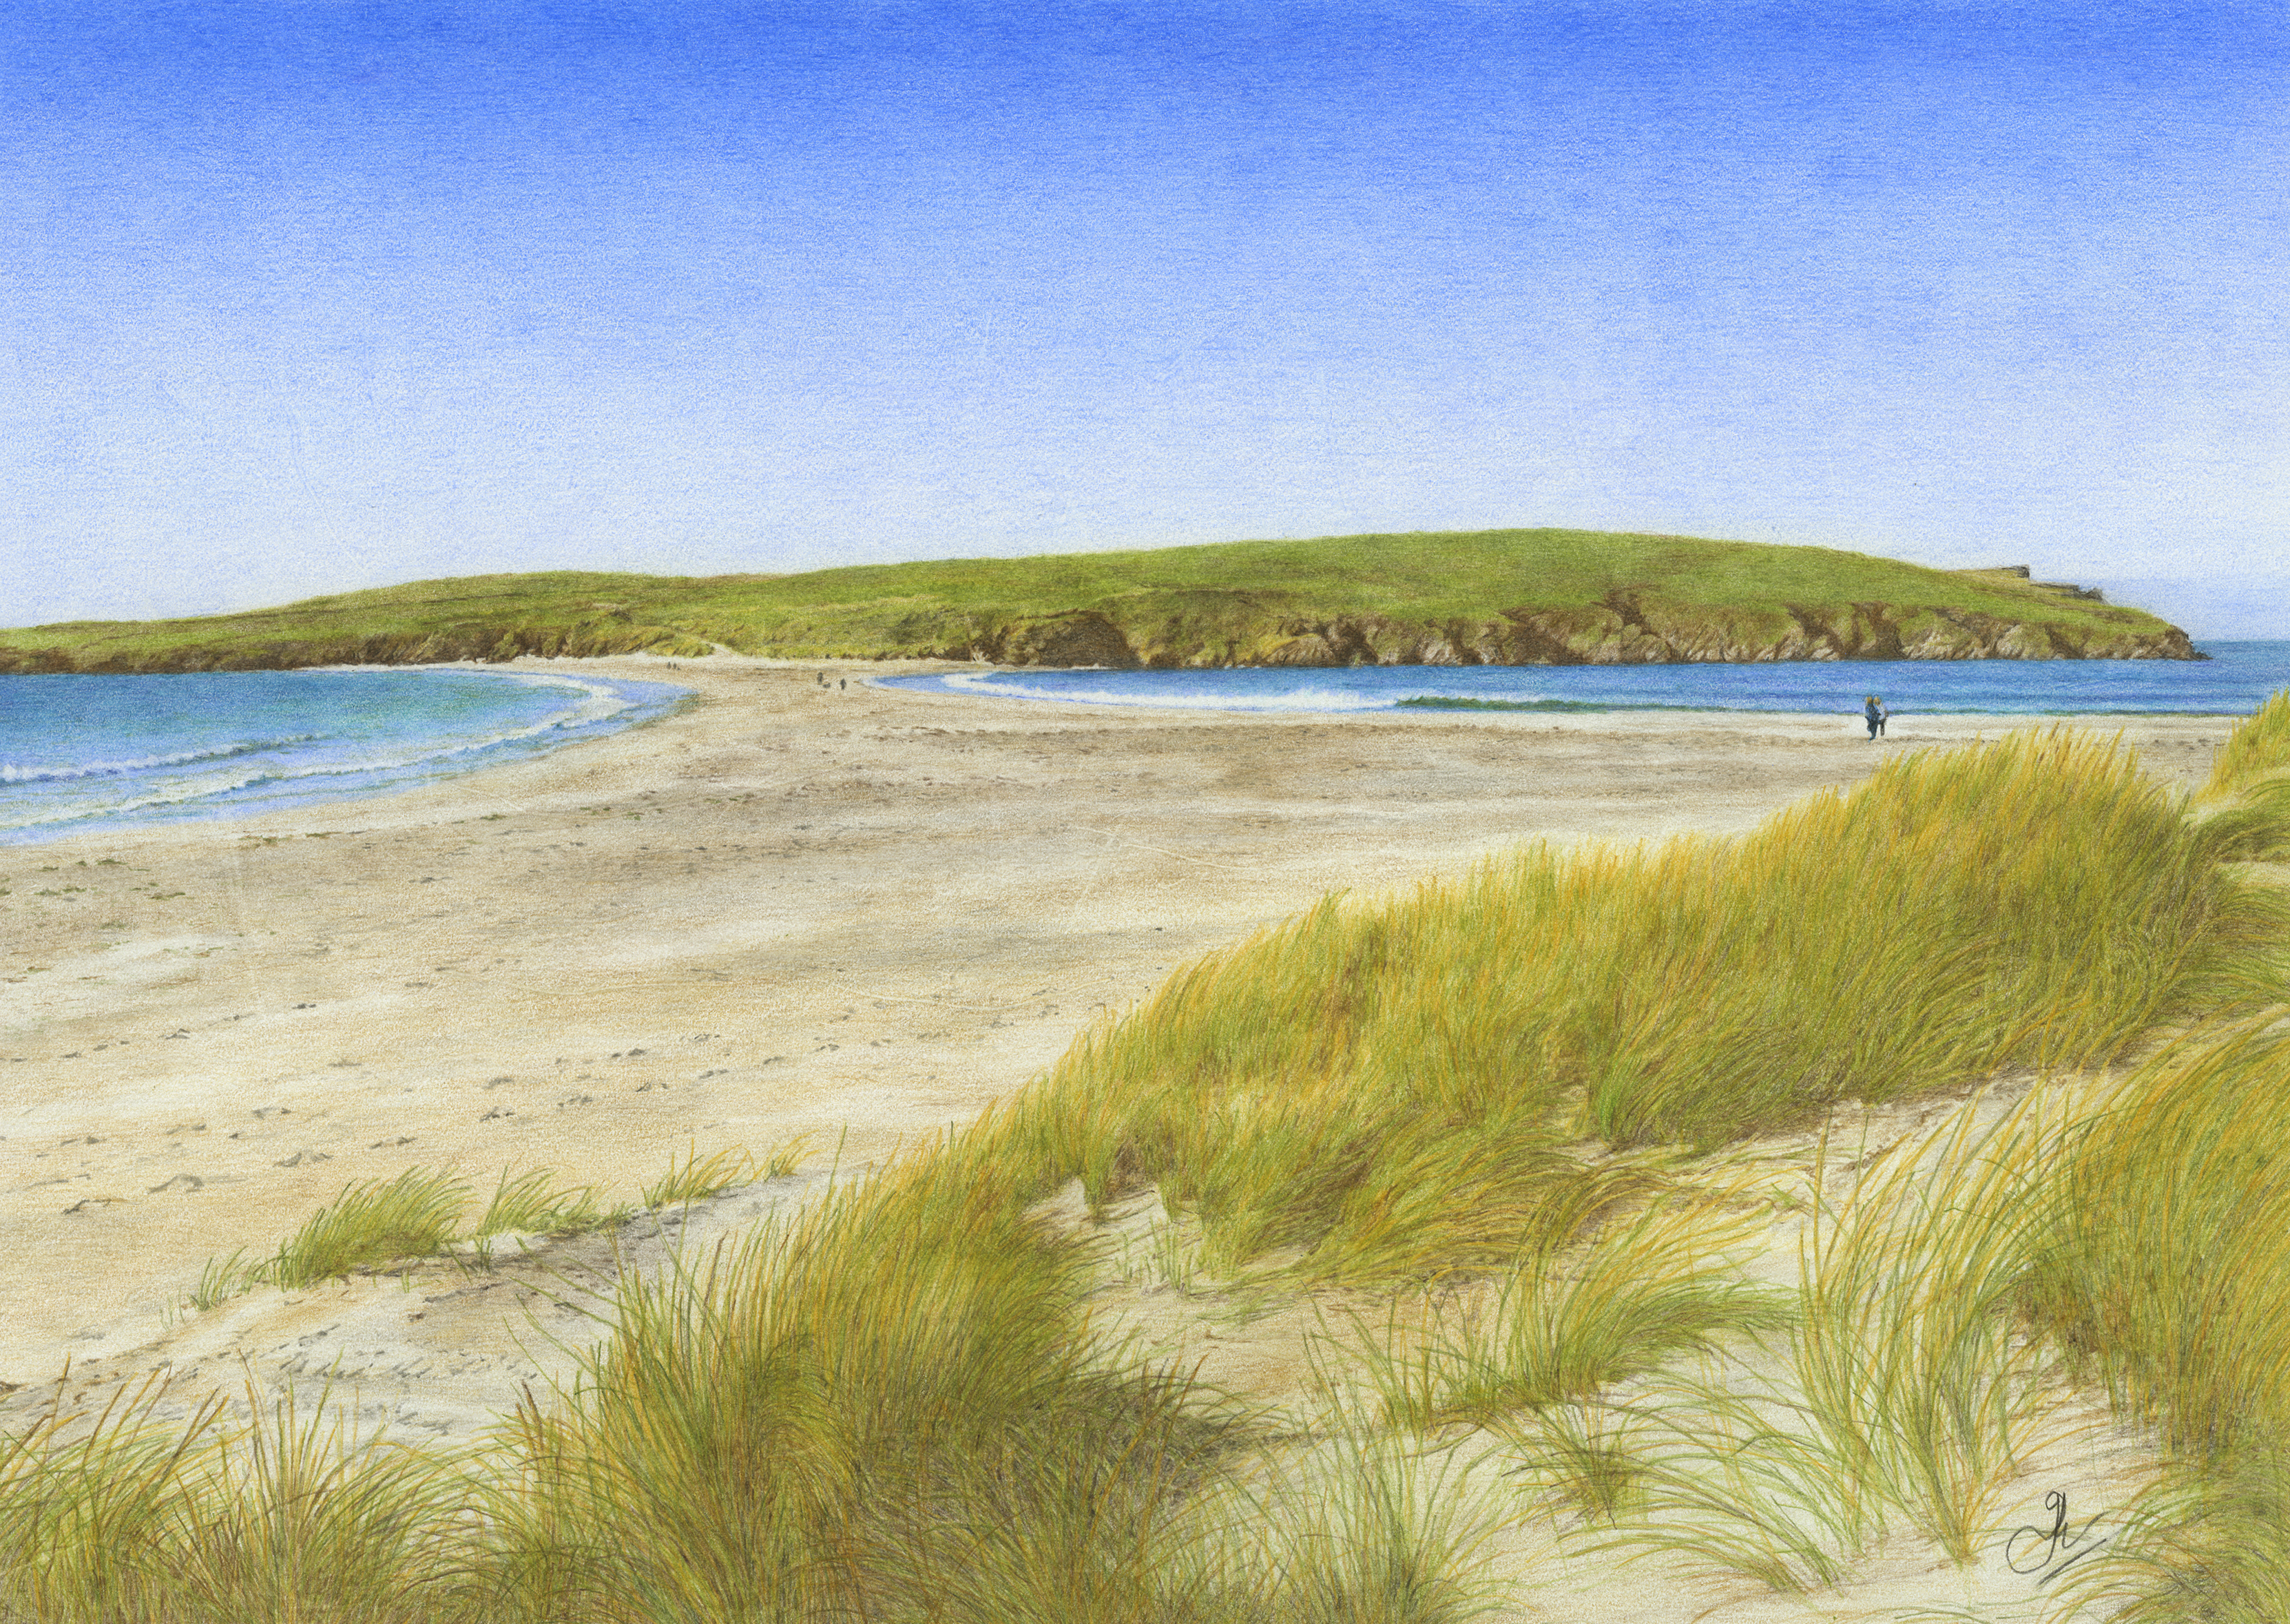 St Ninian's Isle & Tombolo: